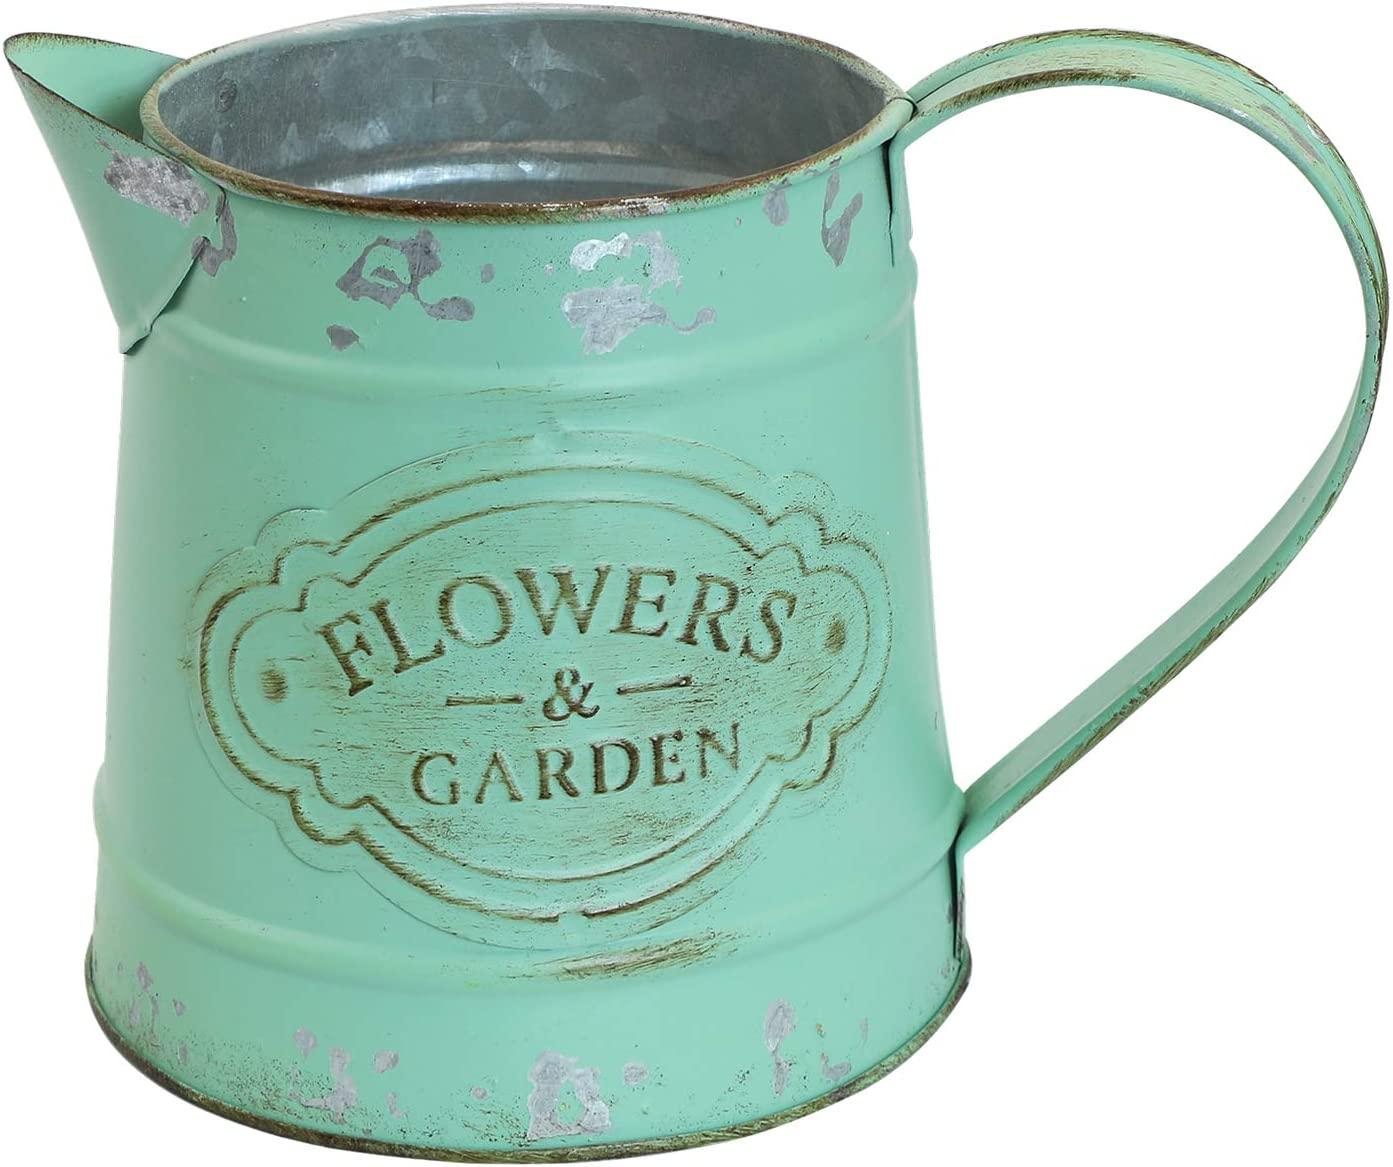 SHINGONE Vintage French Rustic Style Primitive Metal Vase Shabby Chic Pitcher Jug Flower Vase for Home & Garden Decoration